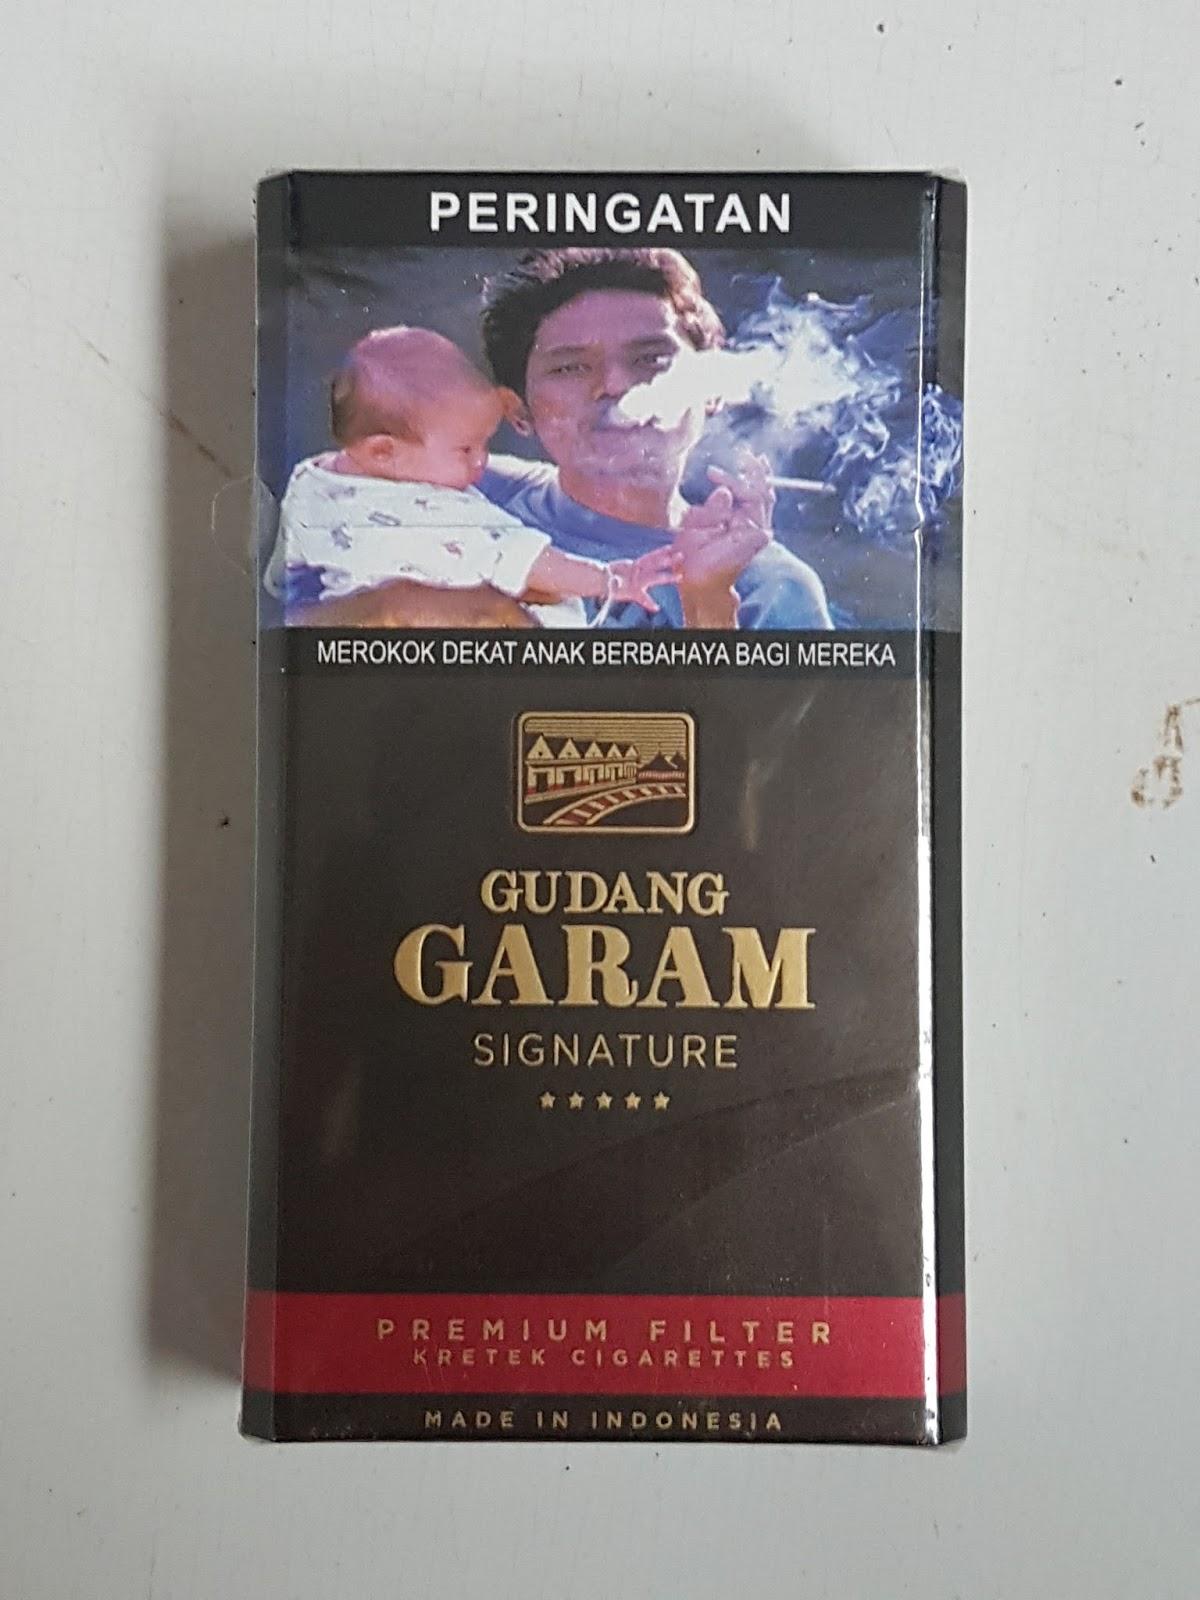 Gudang Garam Signature, SKM Full Flavor Ukuran King Size